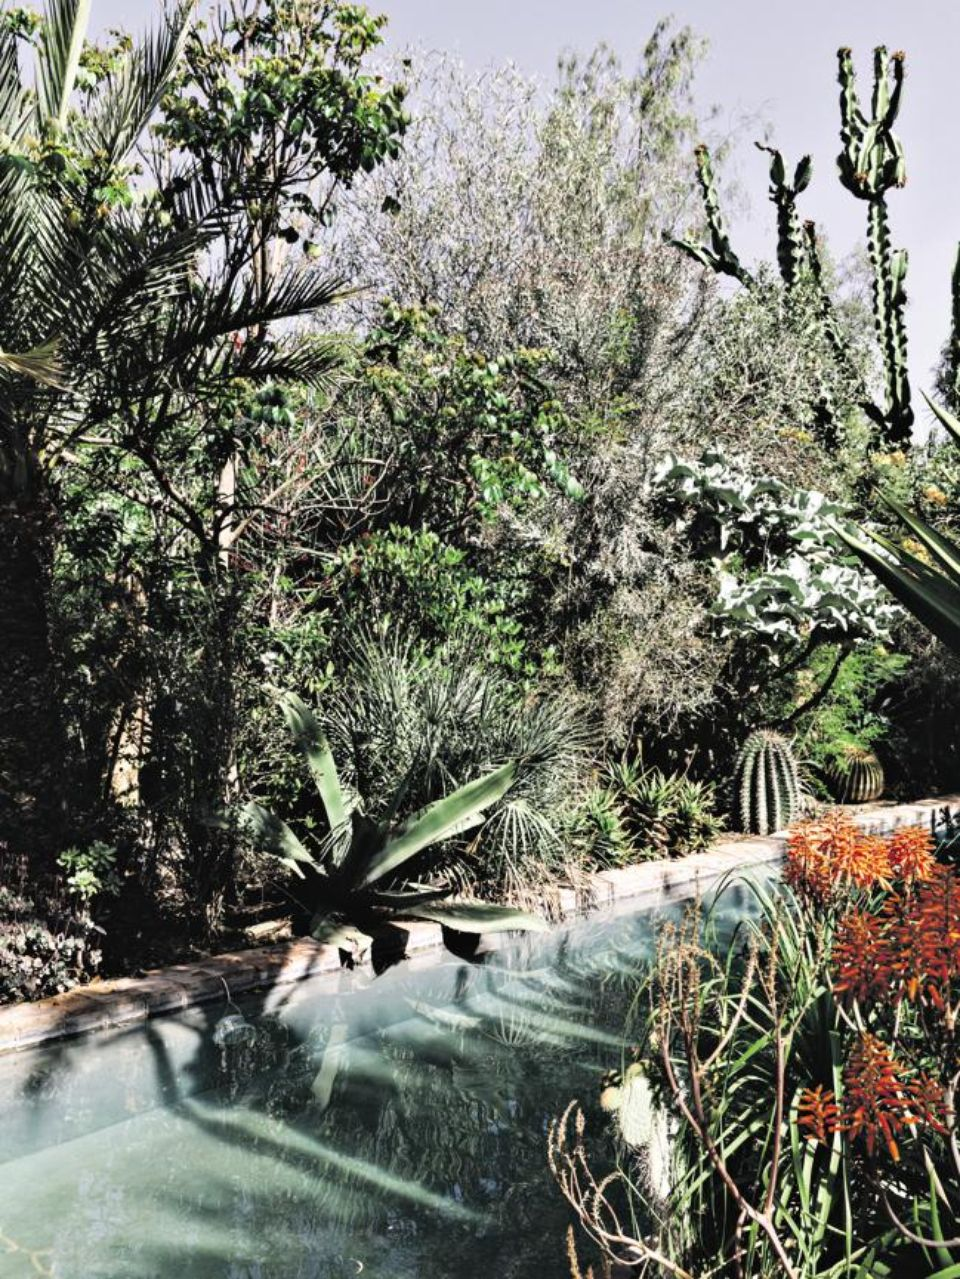 Le jardin Dar al Hossoun, un incroyable espace botanique. Photo Baptiste de Ville d'Avray. Hanslucas